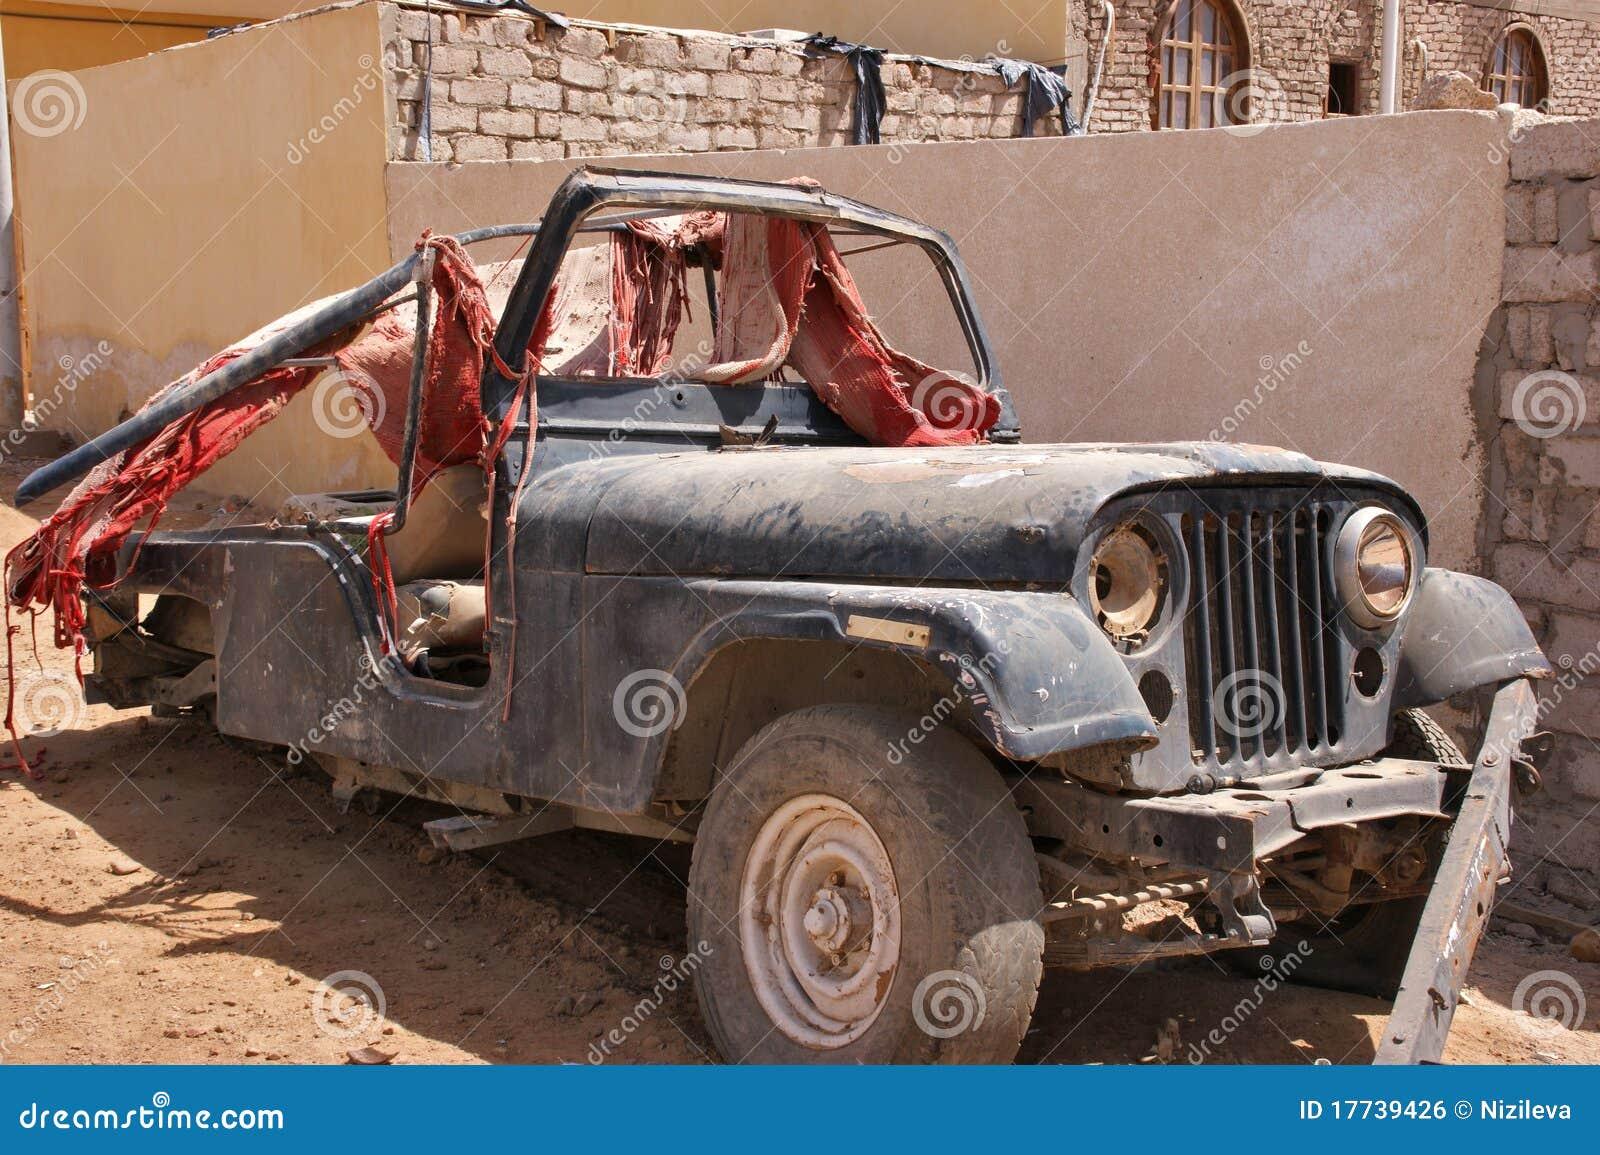 Old Broken Car Royalty Free Stock Image Image 17739426